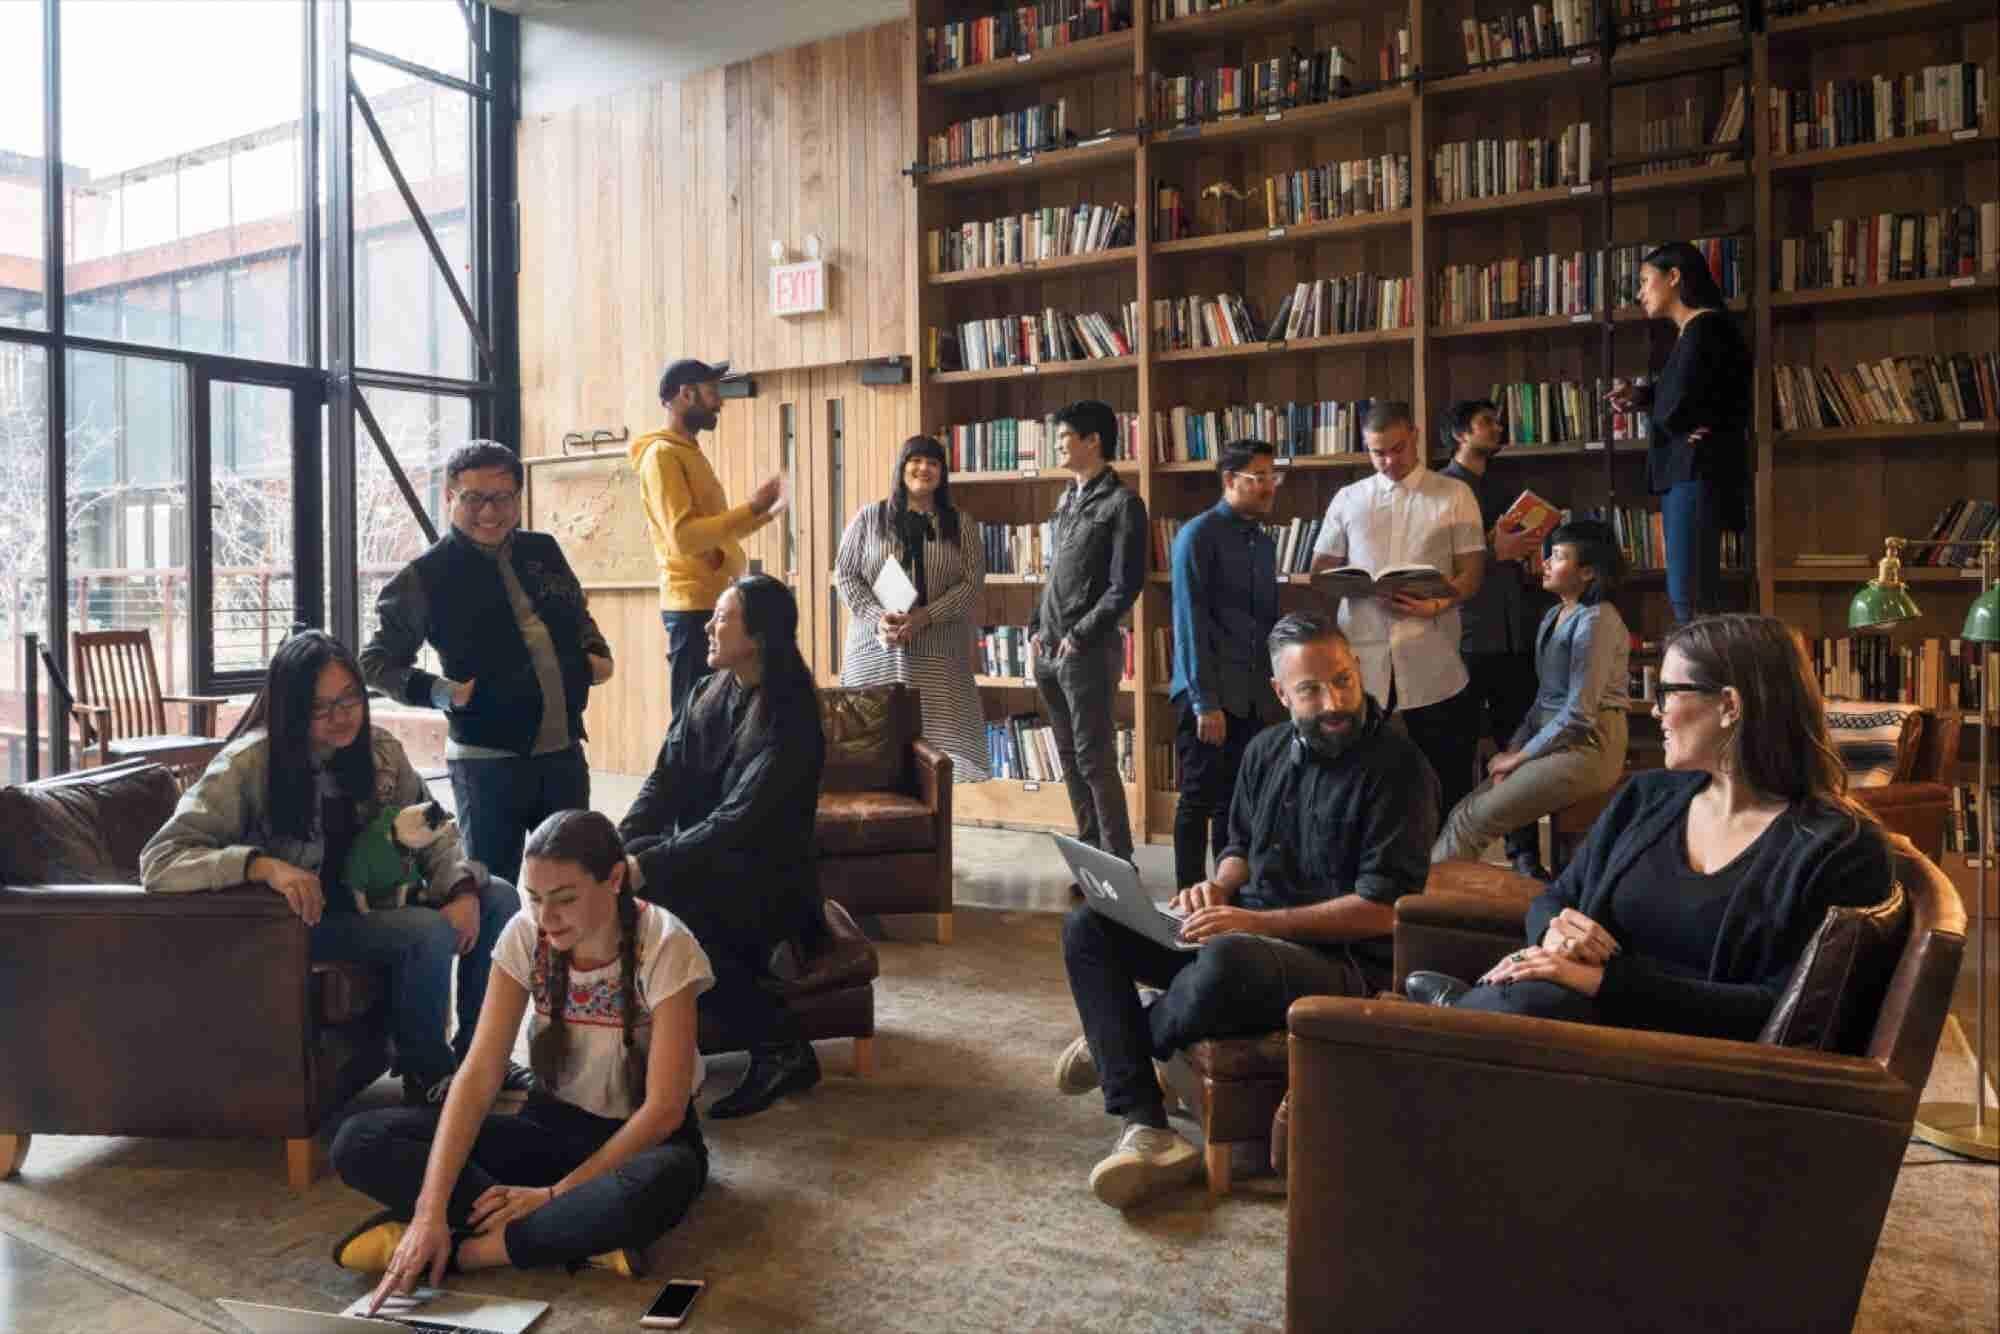 Going Inside the Kickstarter Office